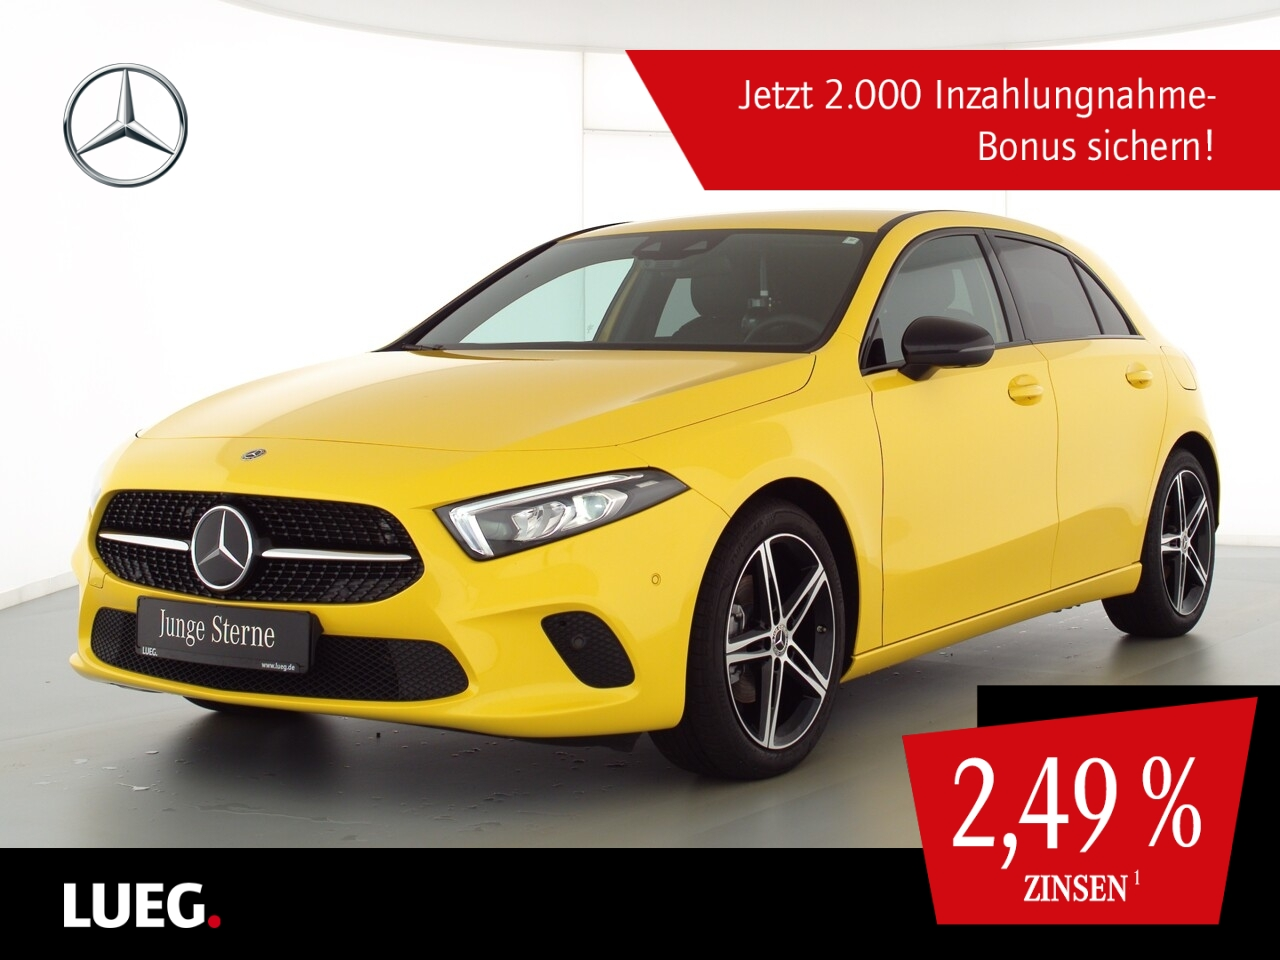 Mercedes-Benz A 180 Progressive+MBUXHighE+LED-HP+AHK+Sthzg+360, Jahr 2020, Benzin